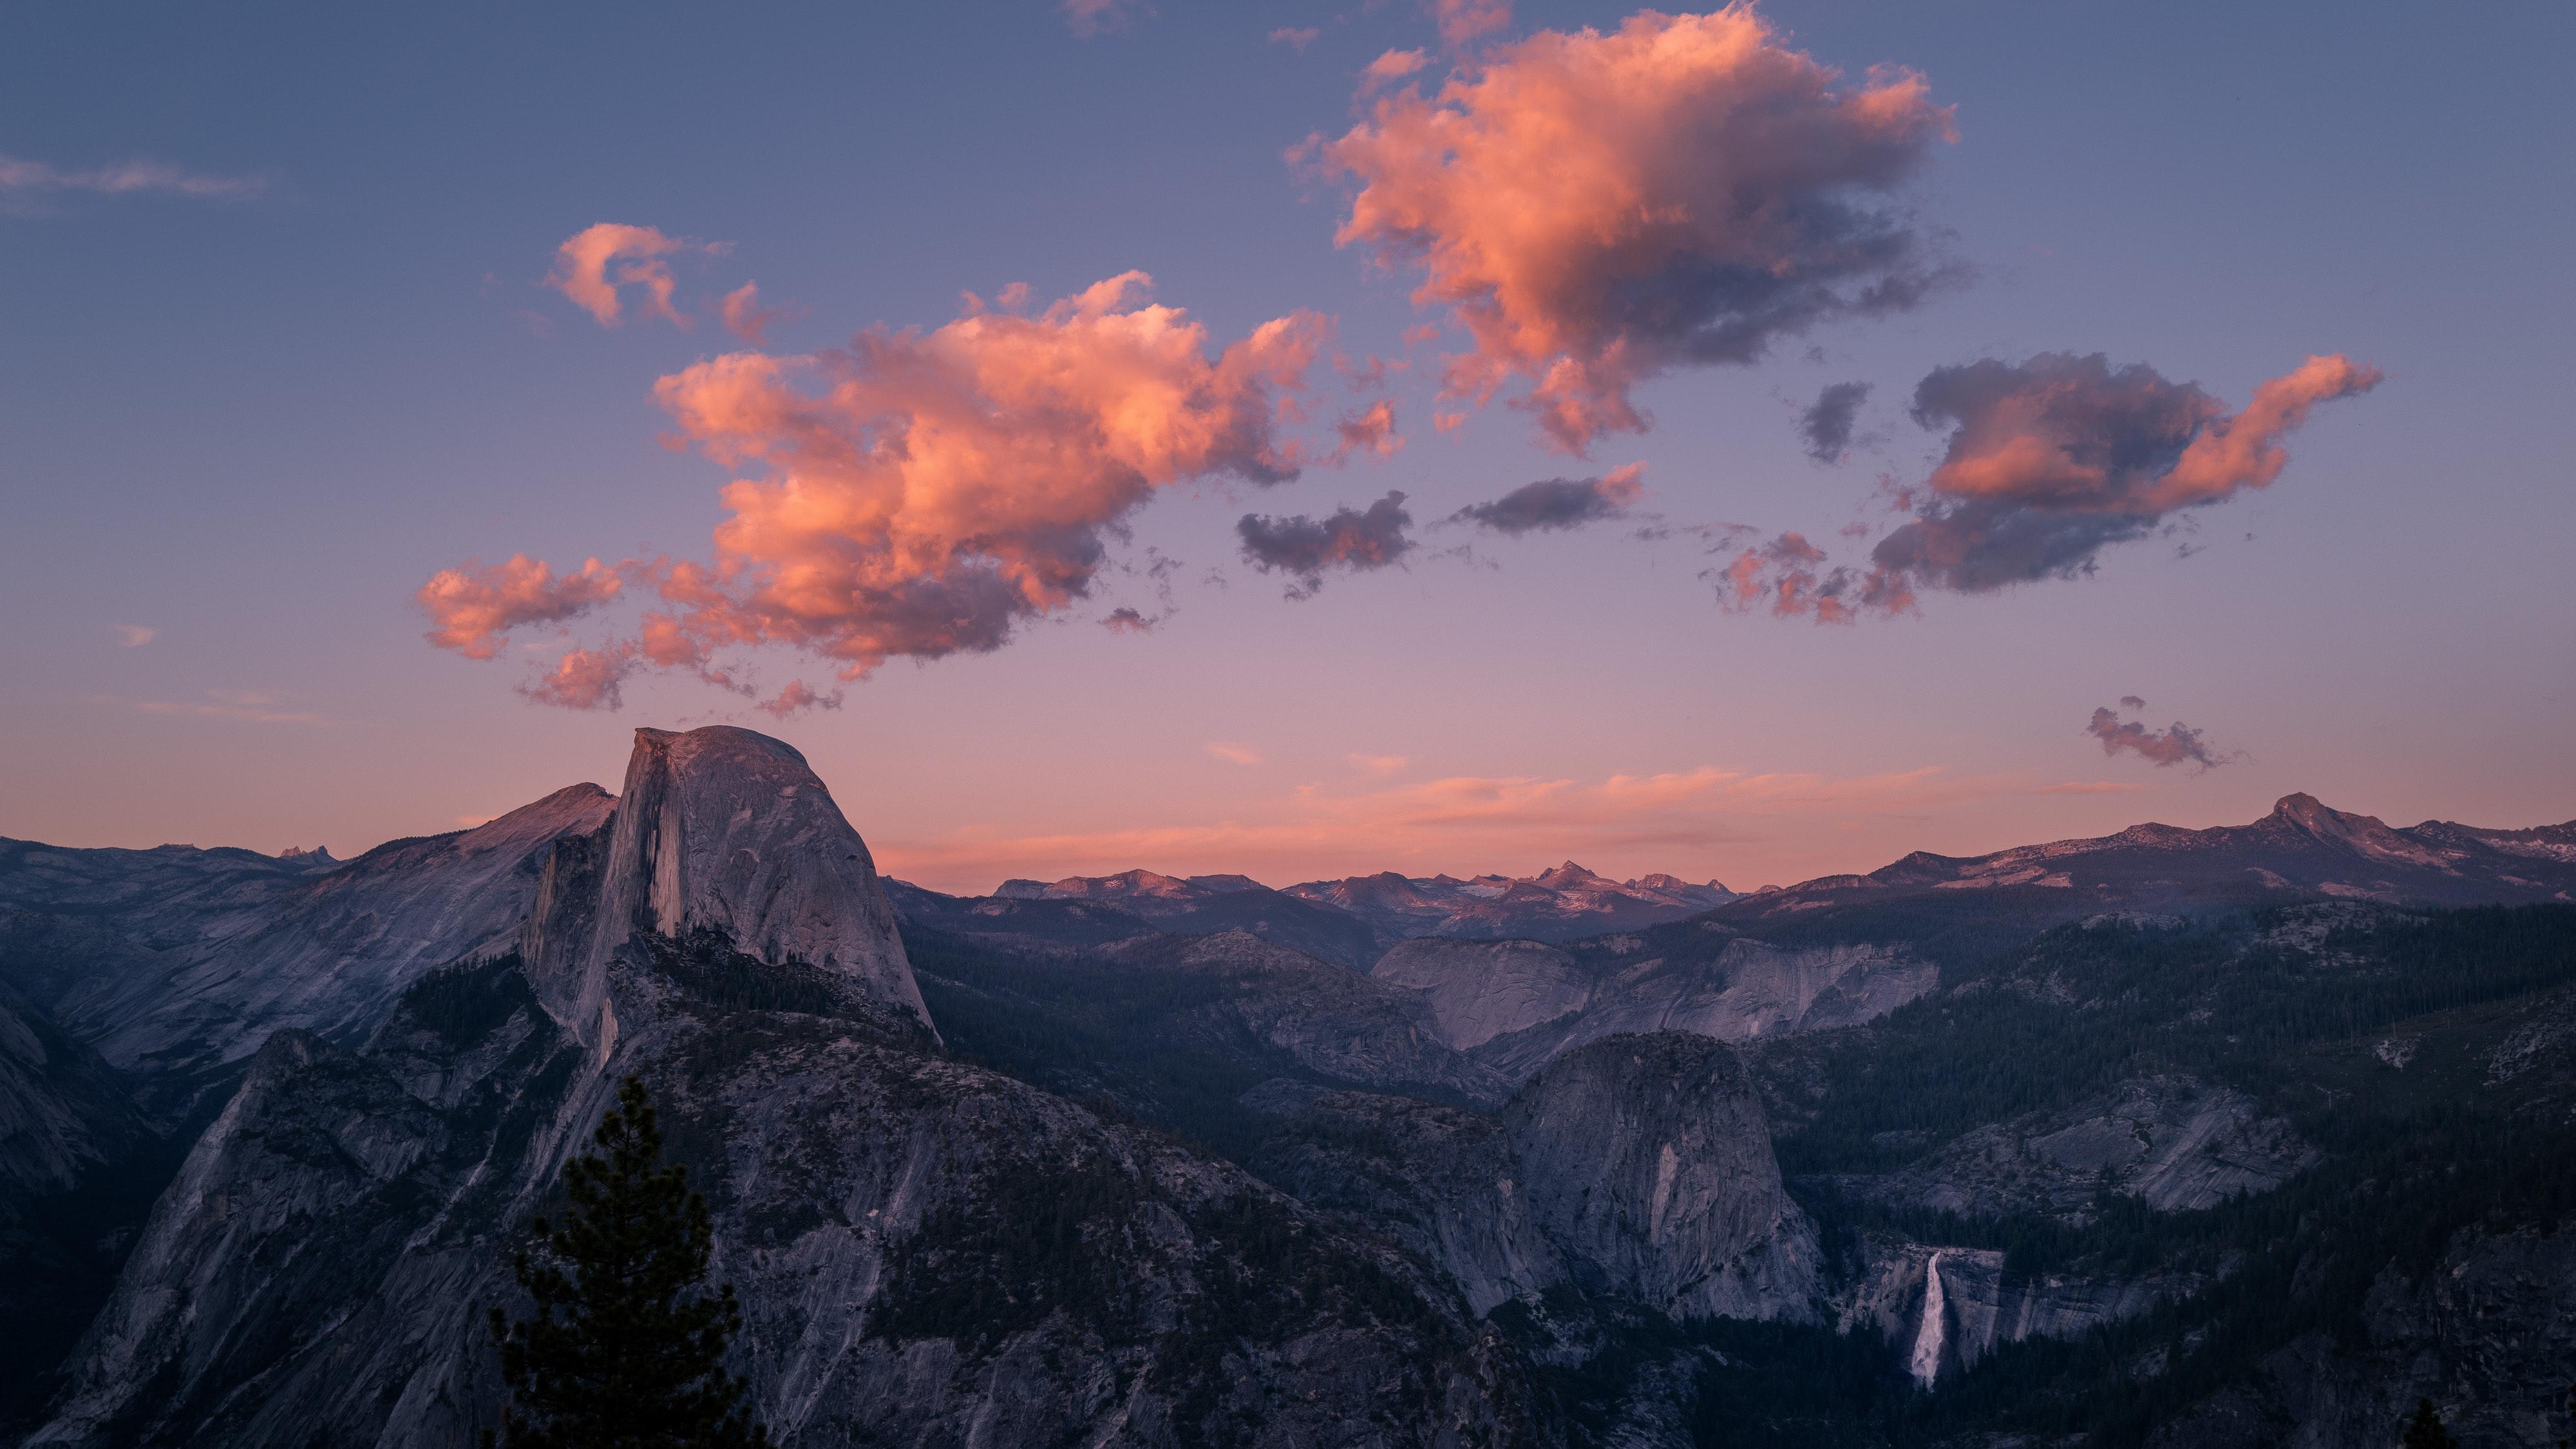 Landscape Clouds Yosemite National Park USA 4000x2250